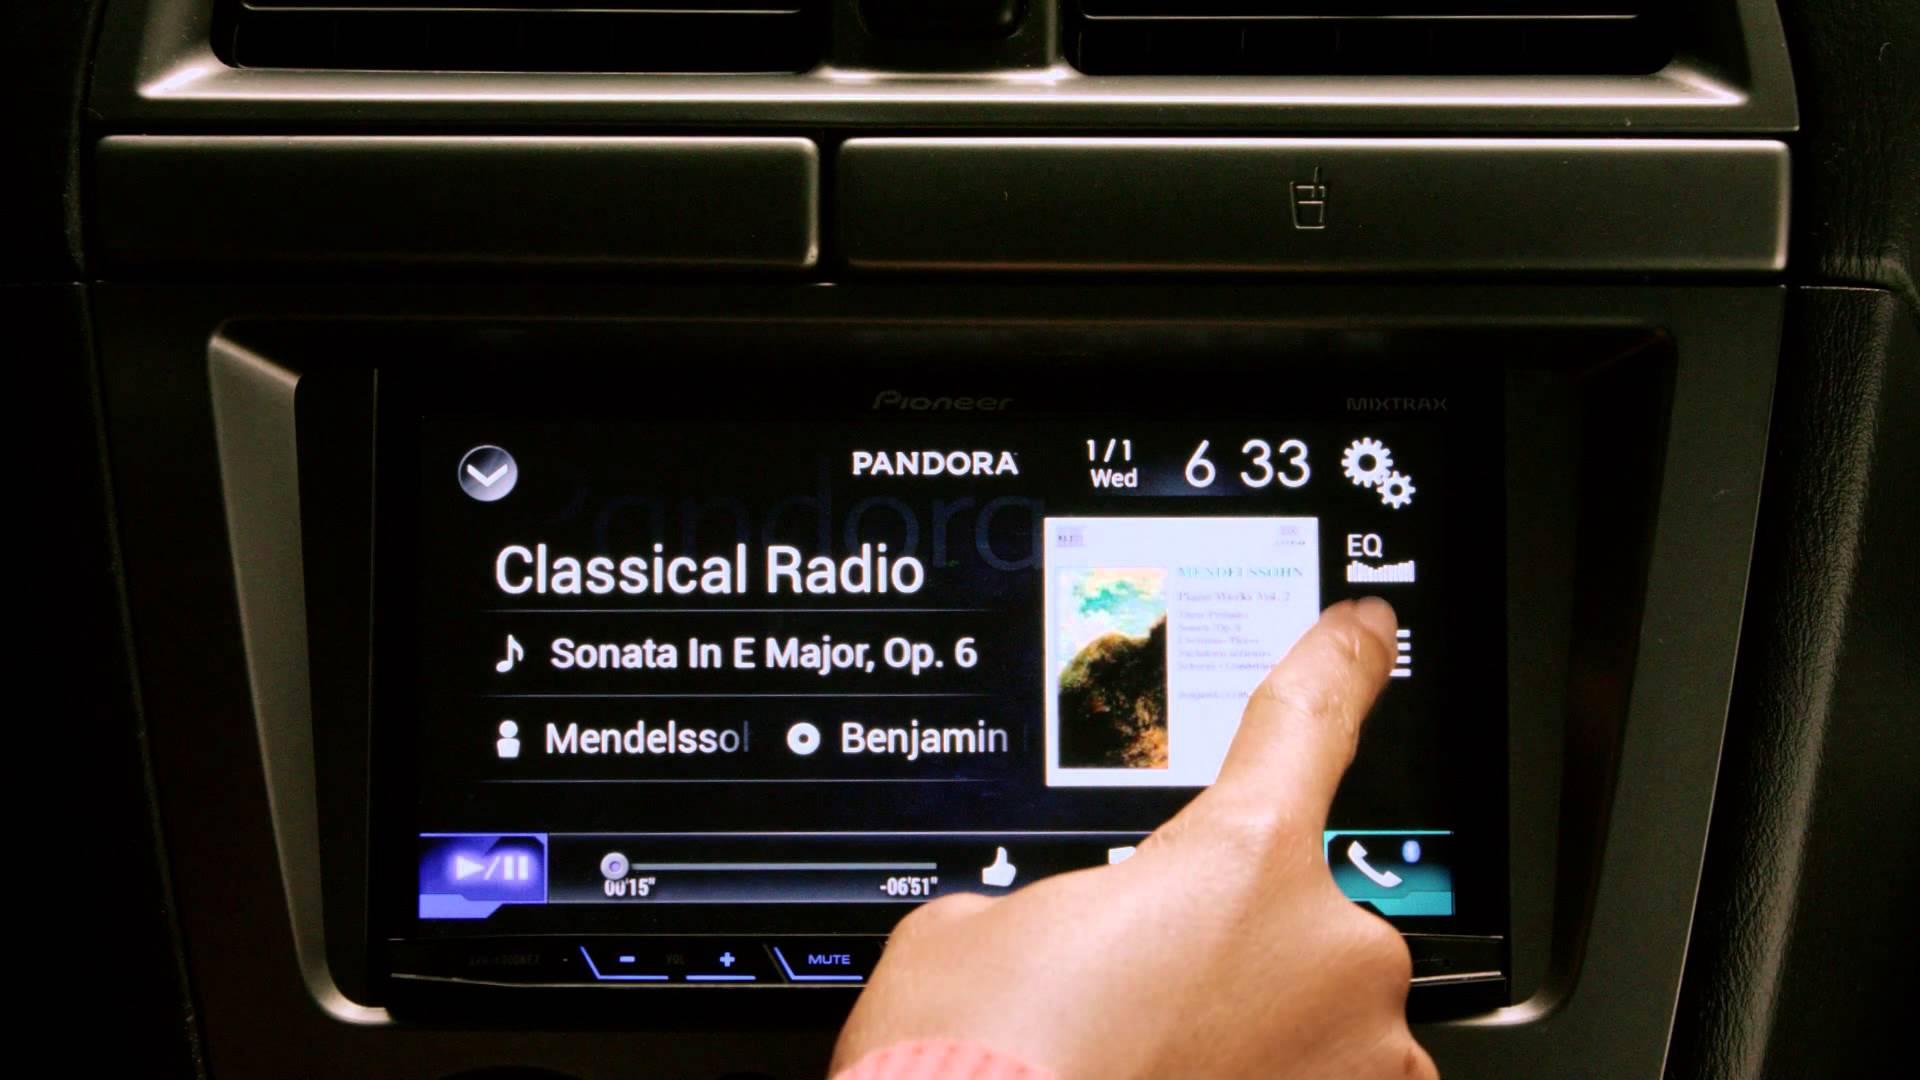 Pandora app streaming on a dashboard touchscreen.